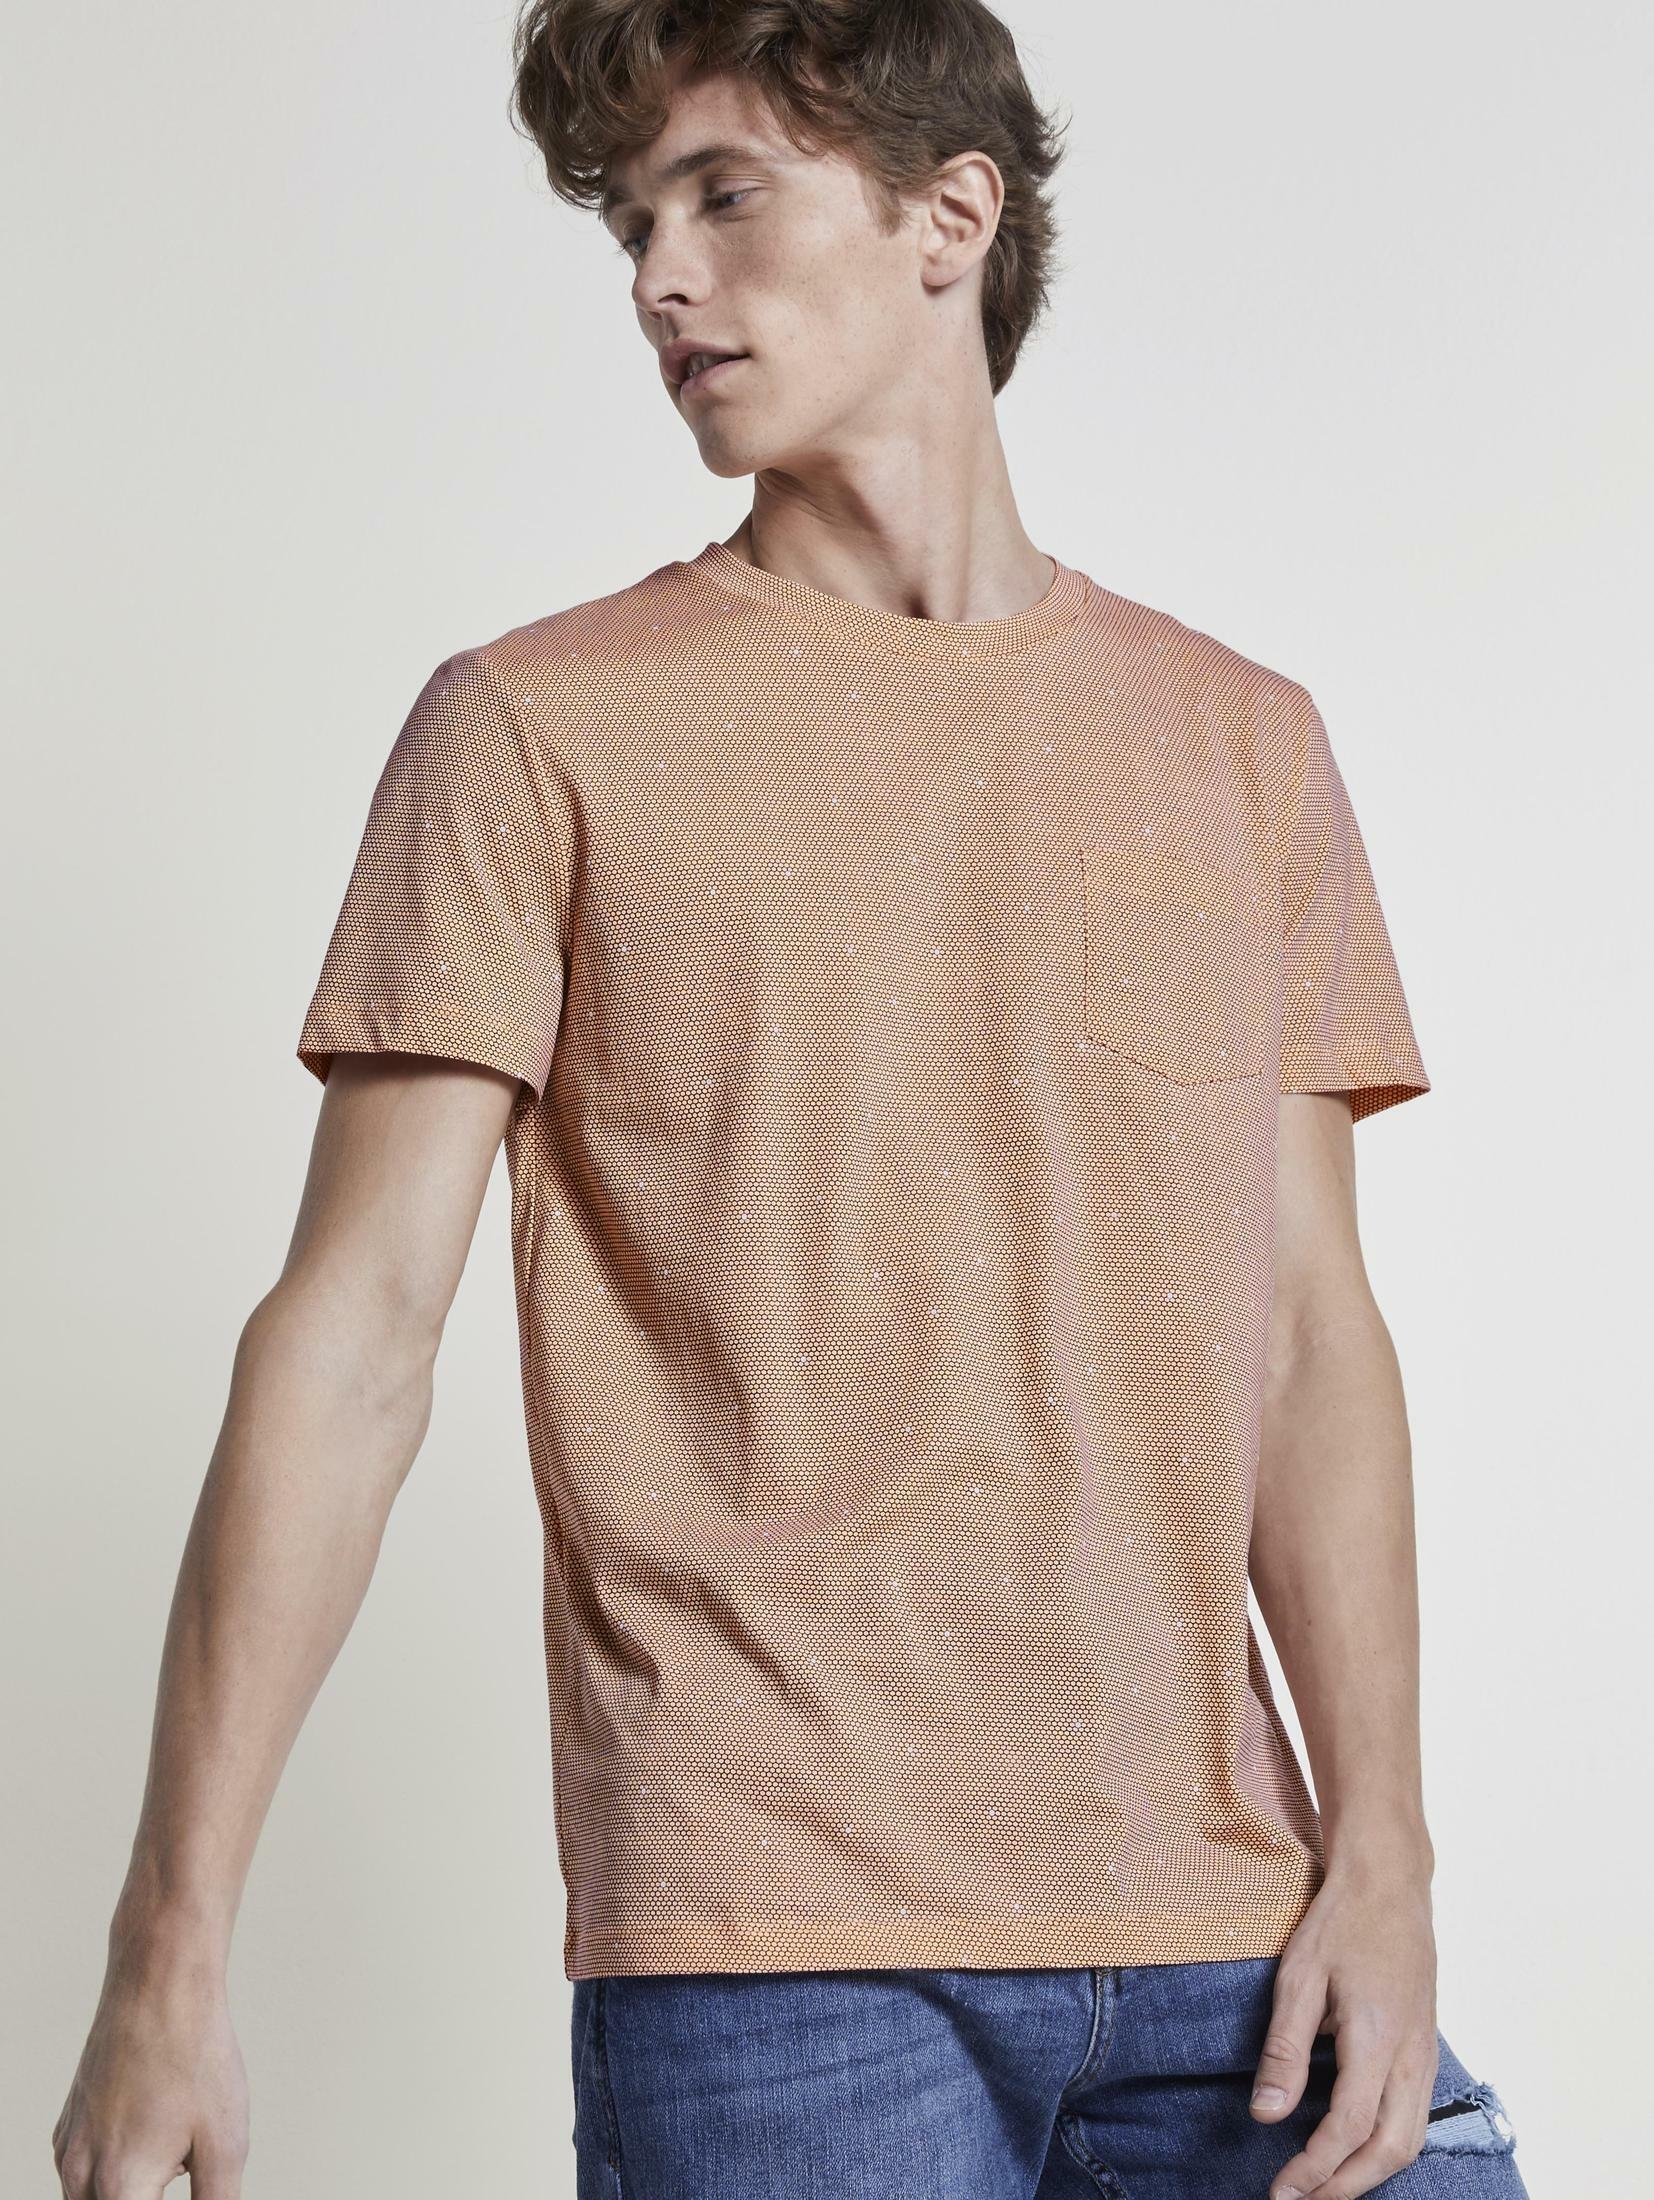 Tom Tailor Denim T-shirt »T-Shirt mit Allover-Print« bij OTTO online kopen